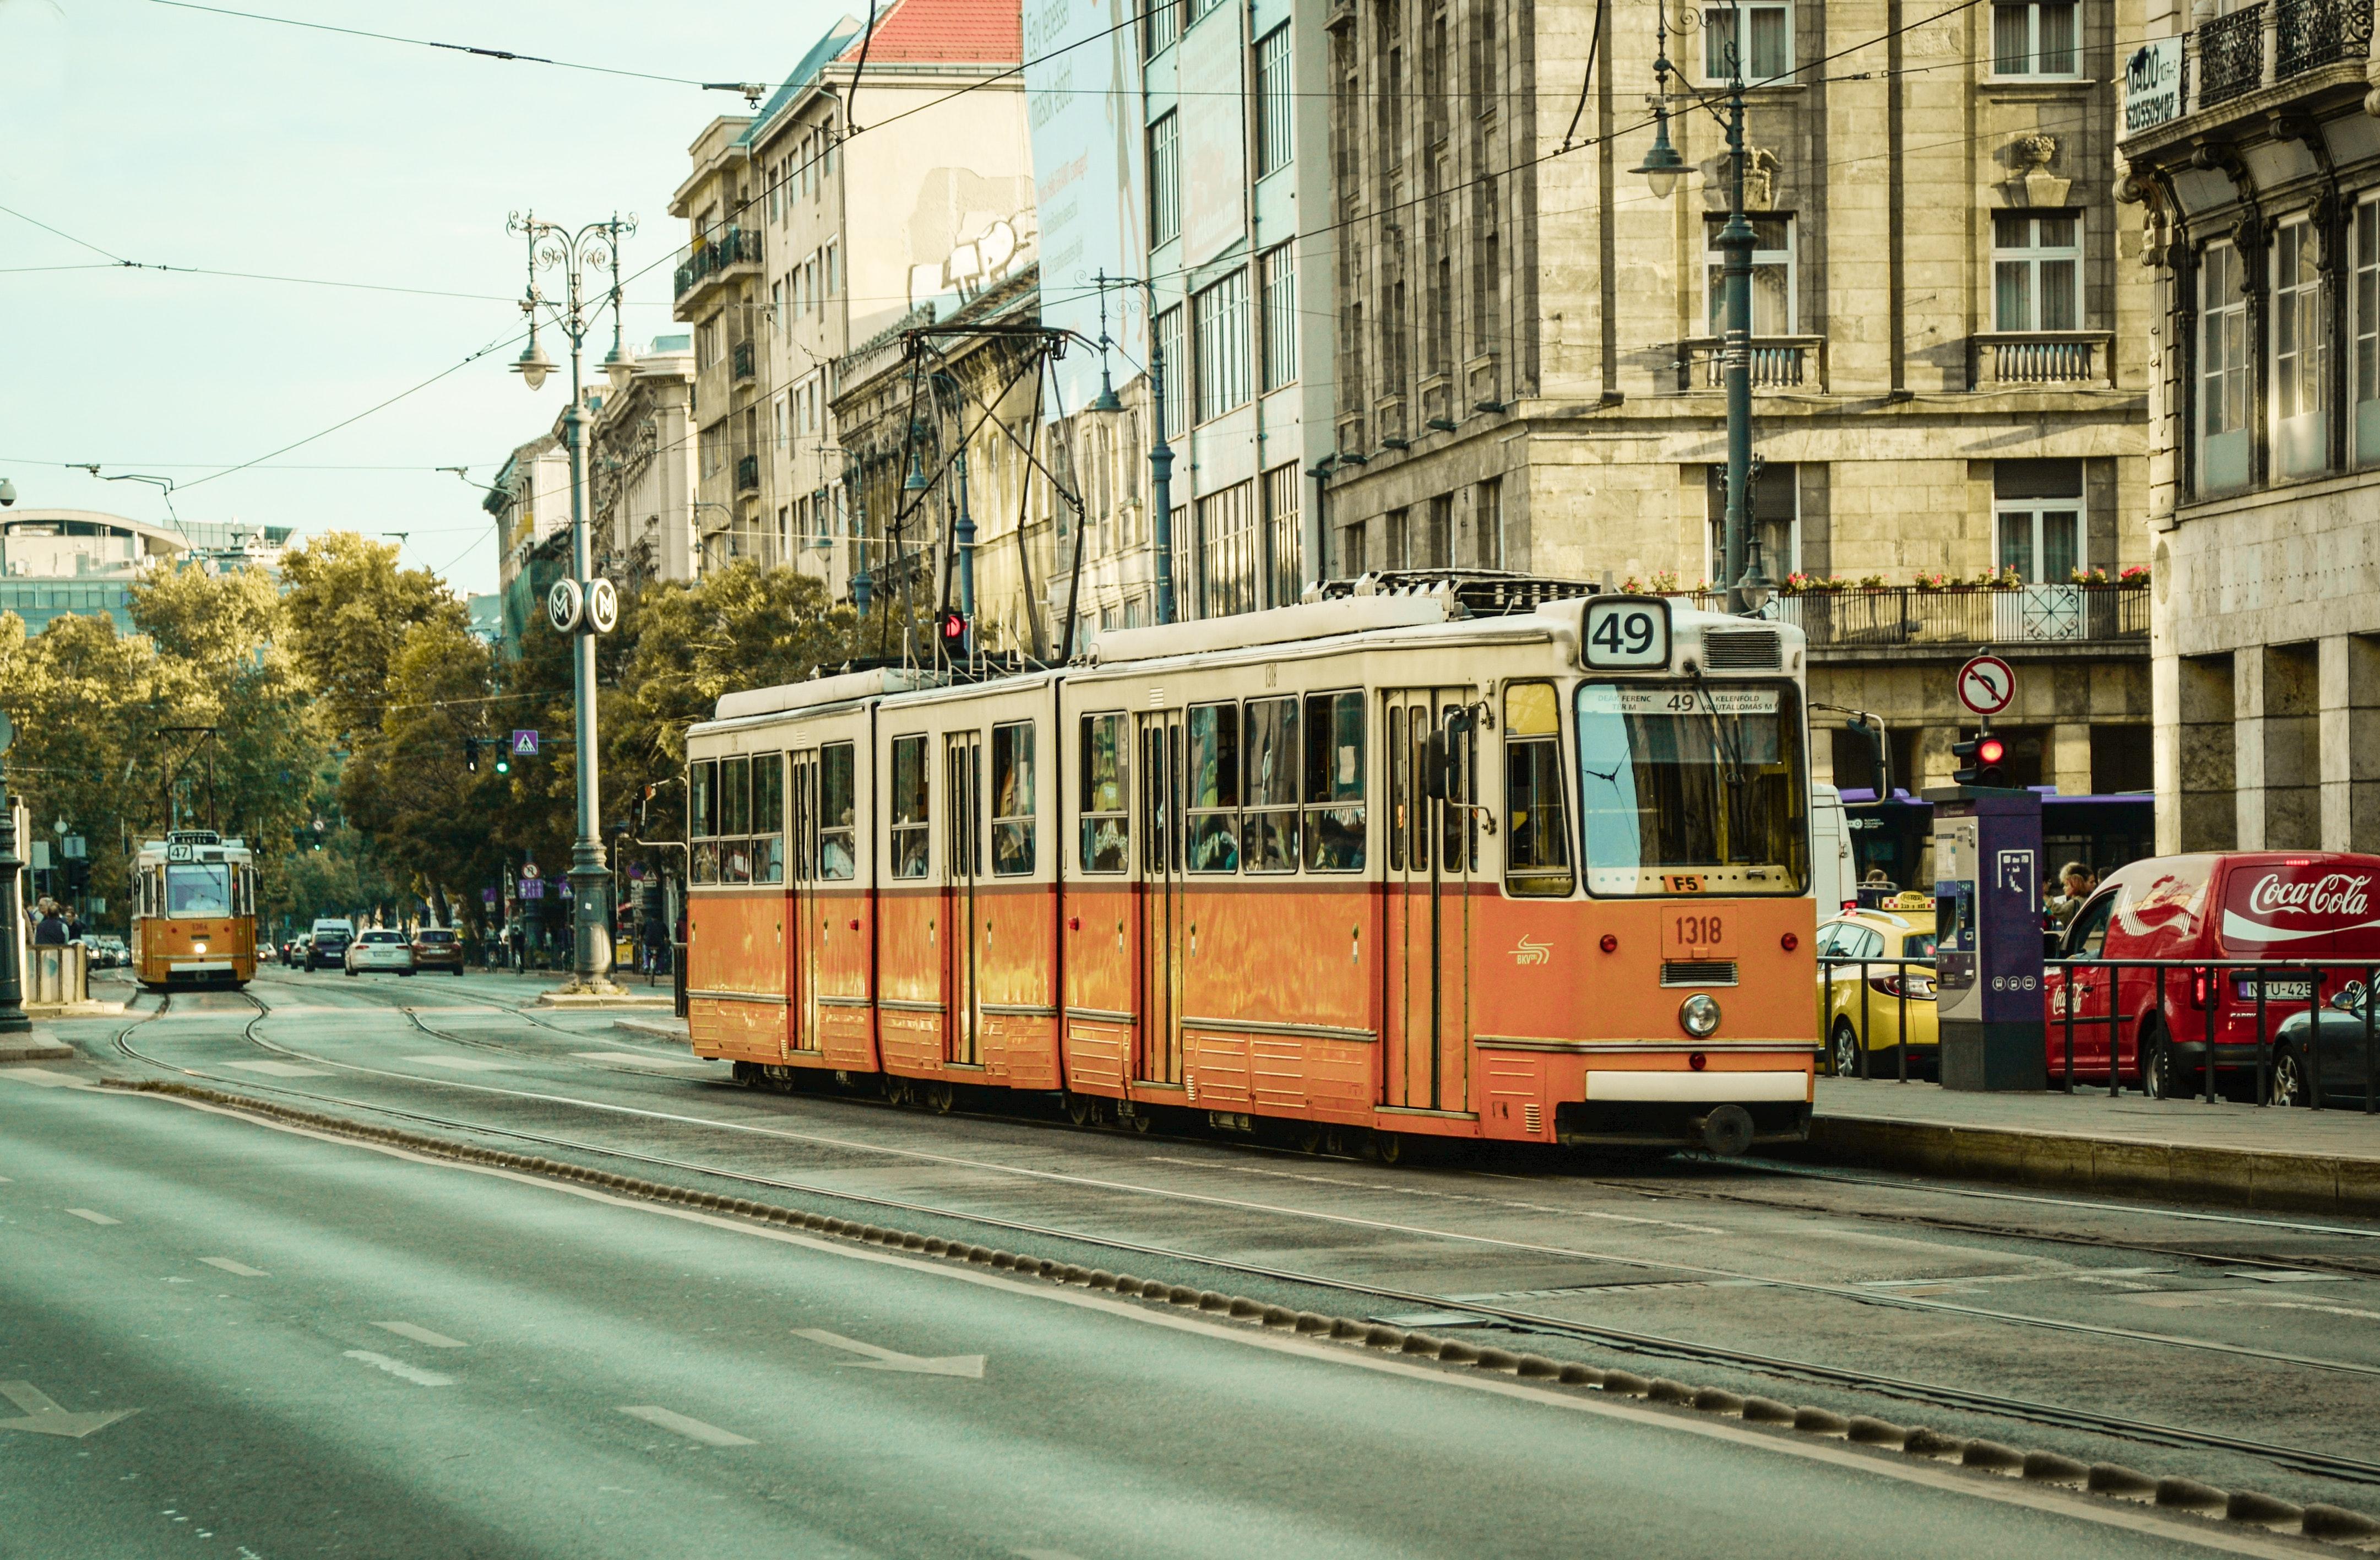 White and Orange Train Near City Buildings, Architecture, Road, Urban, Travel, HQ Photo